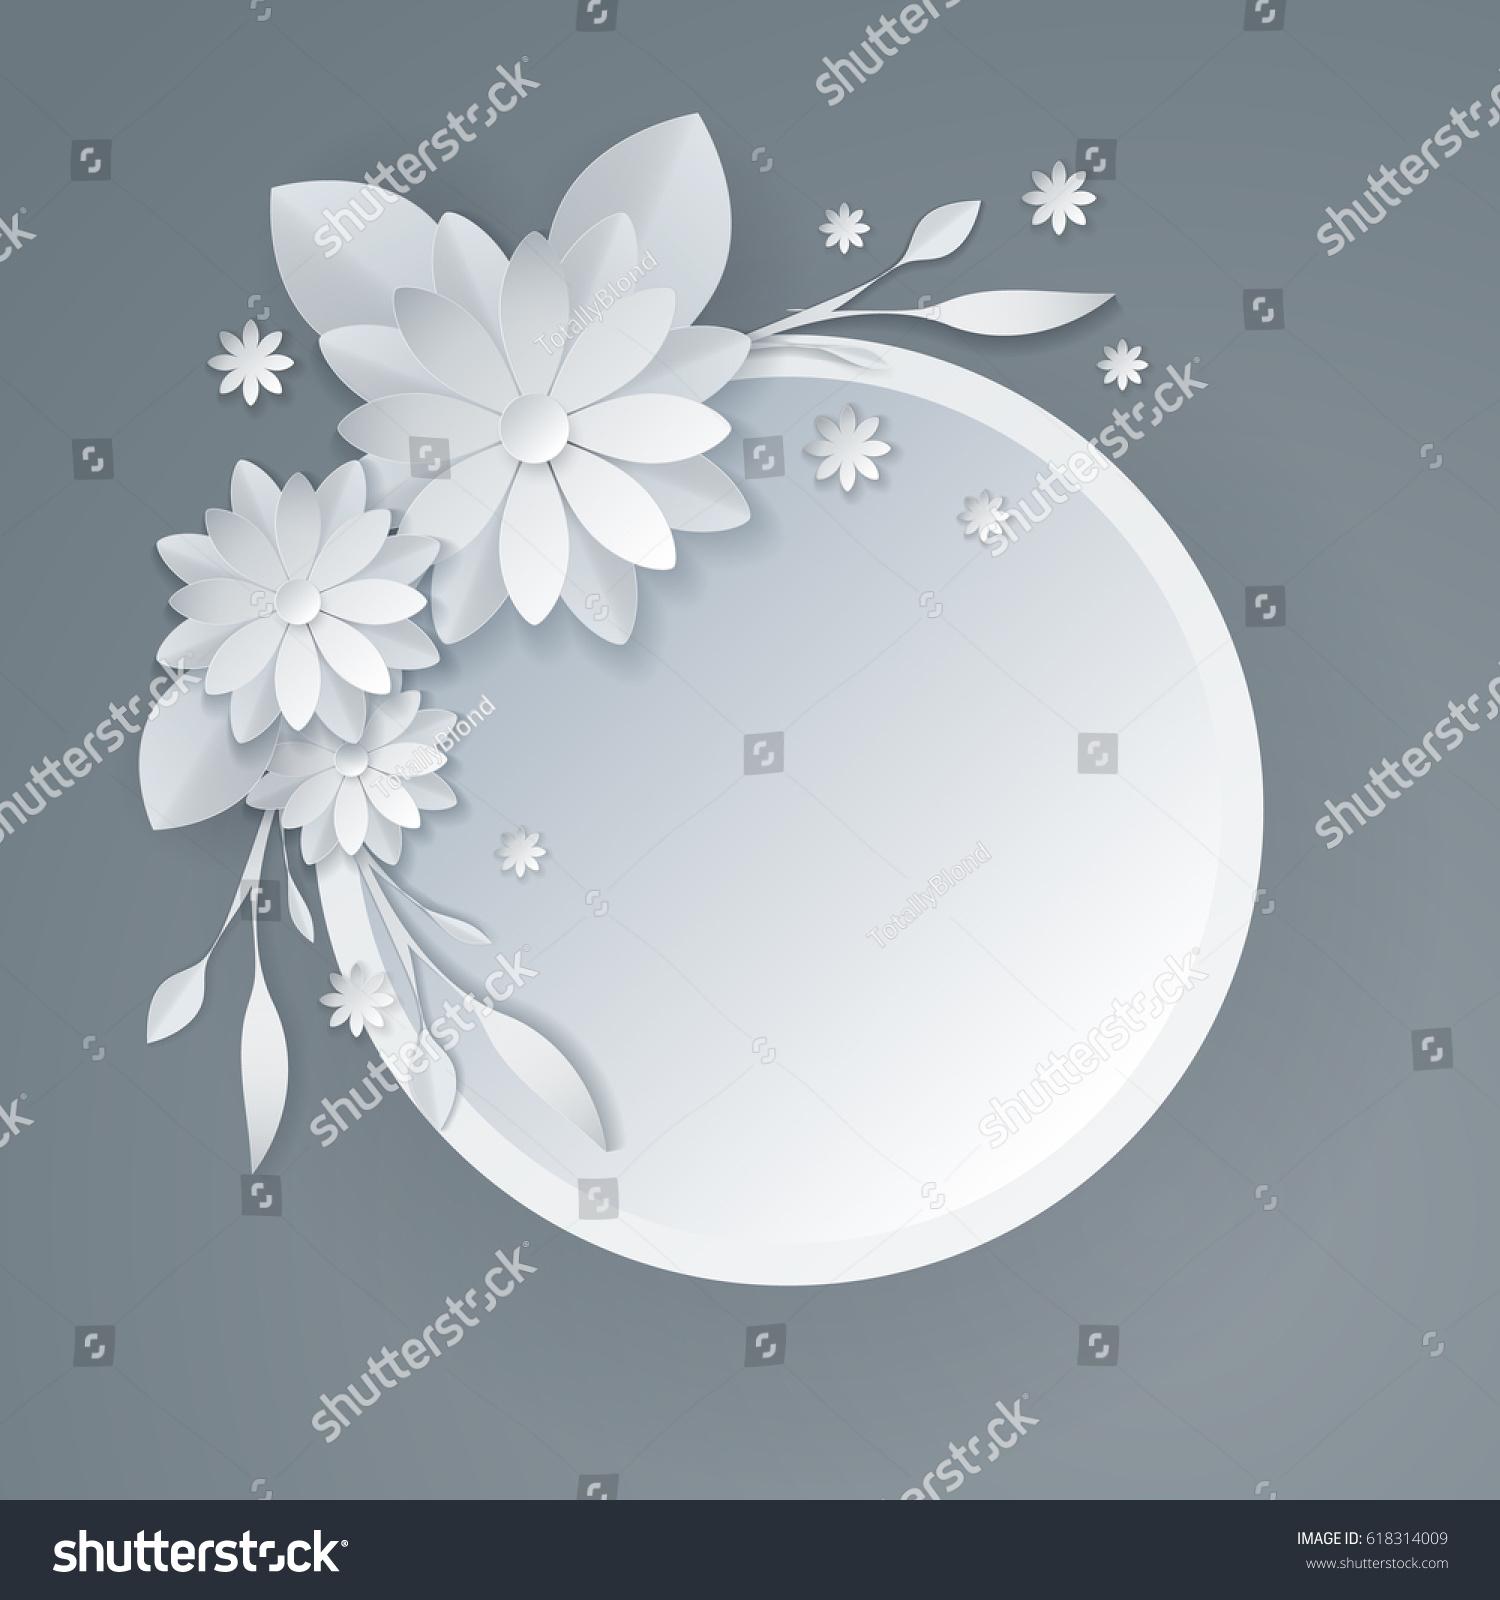 3d white paper craft flowers background stock vector 618314009 3d white paper craft flowers background spring wedding decoration summer bridal bouquet greeting jeuxipadfo Choice Image